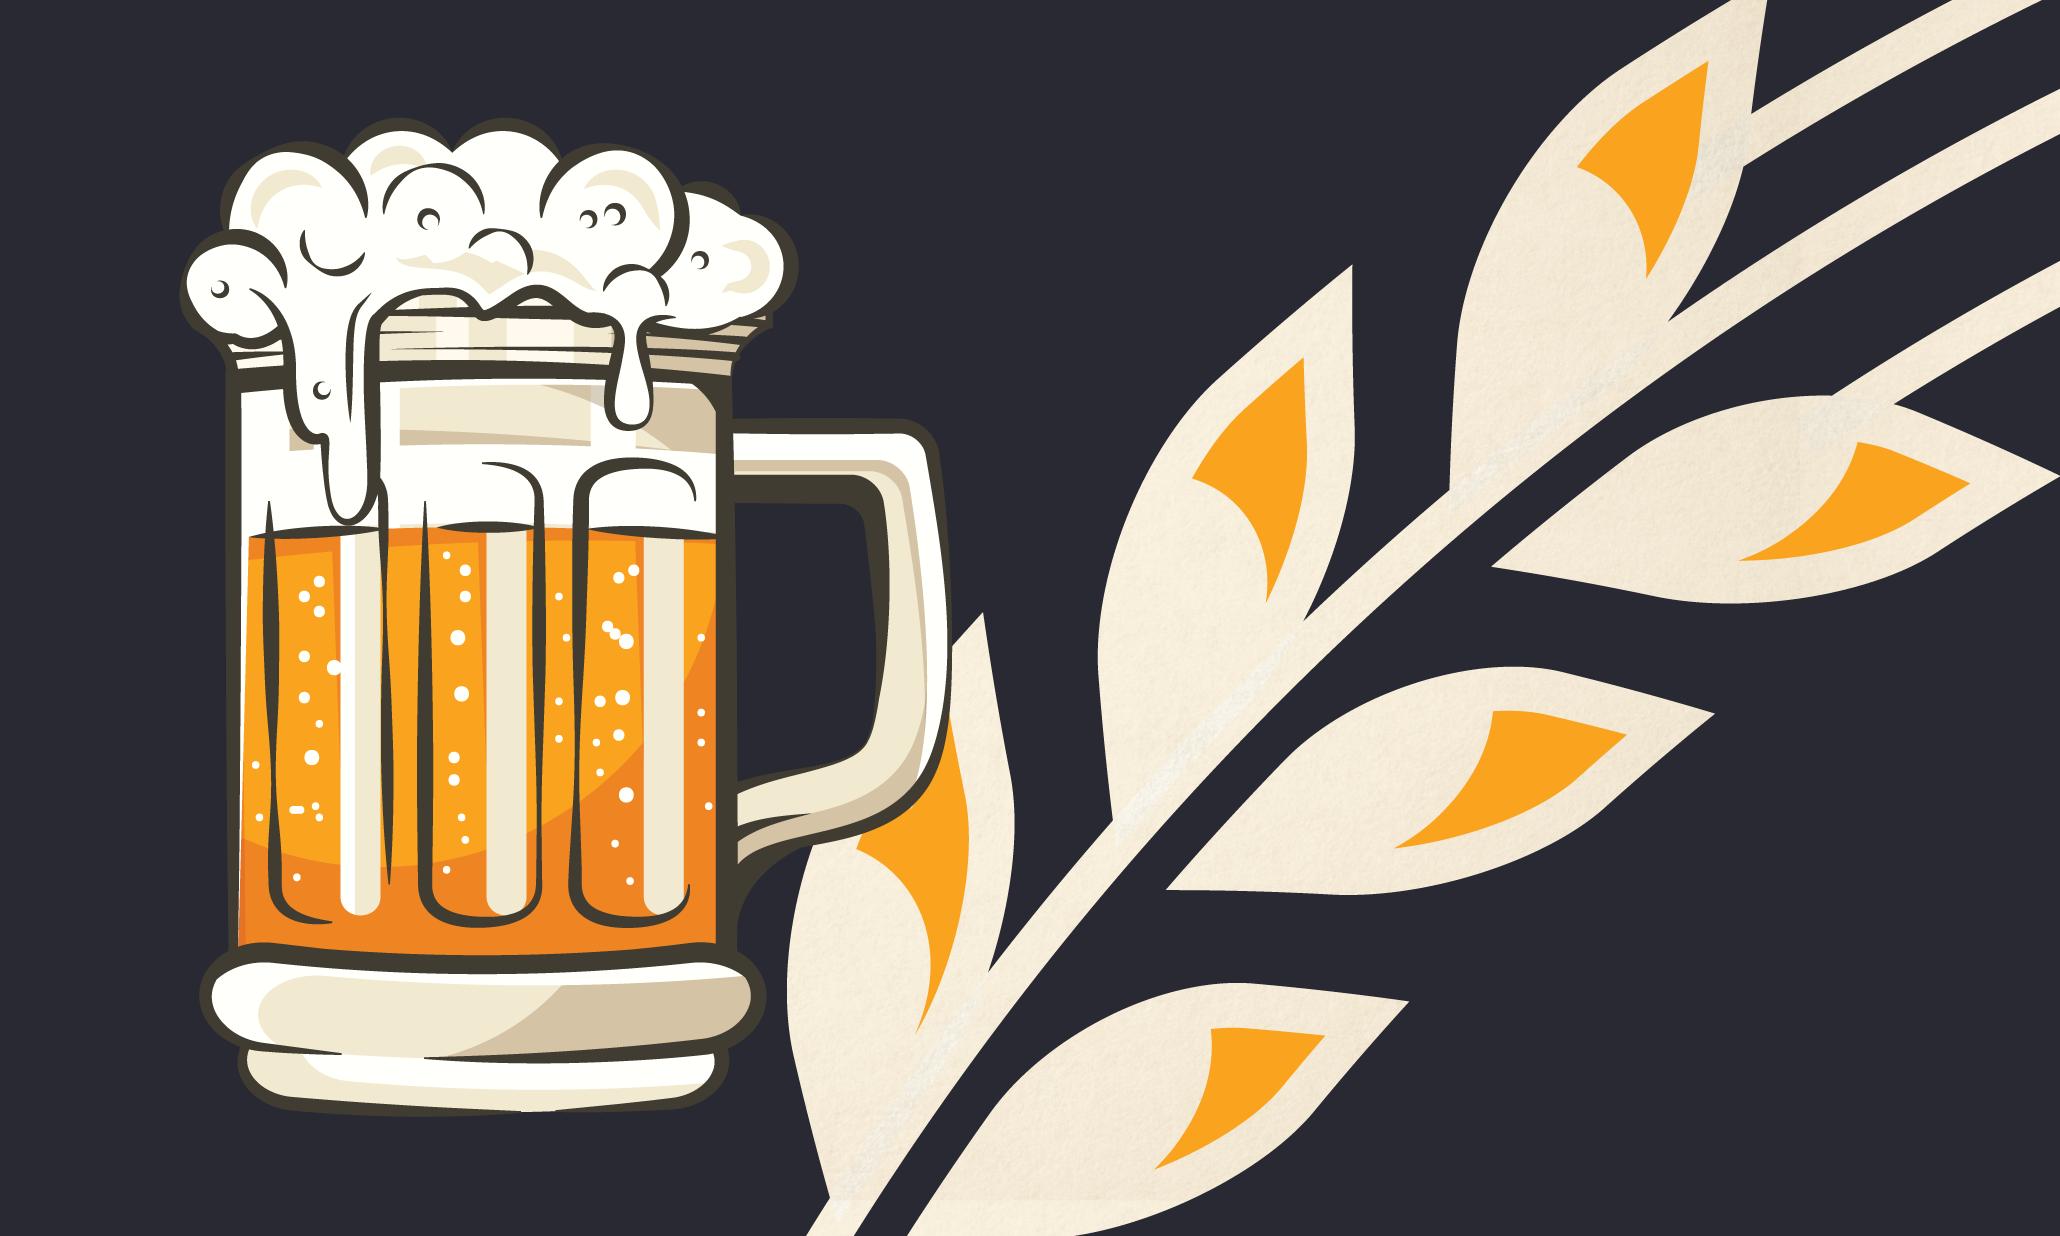 October S Top 9 At 99 Craft Beer Brewery Design 99designs